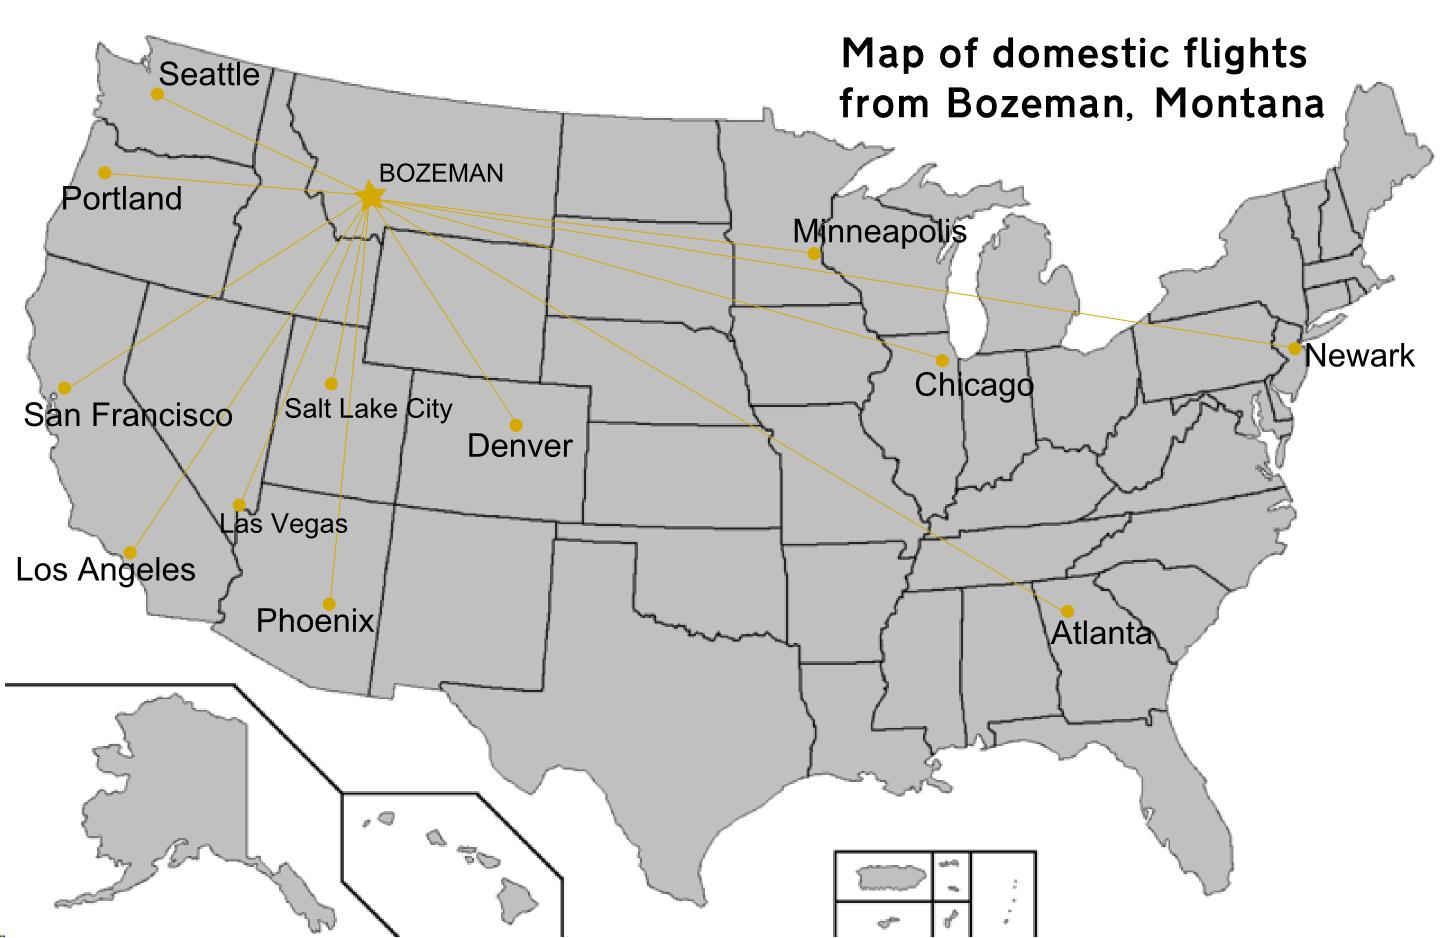 File:Map of domestic flights from Bozeman, Montana.png   Wikimedia